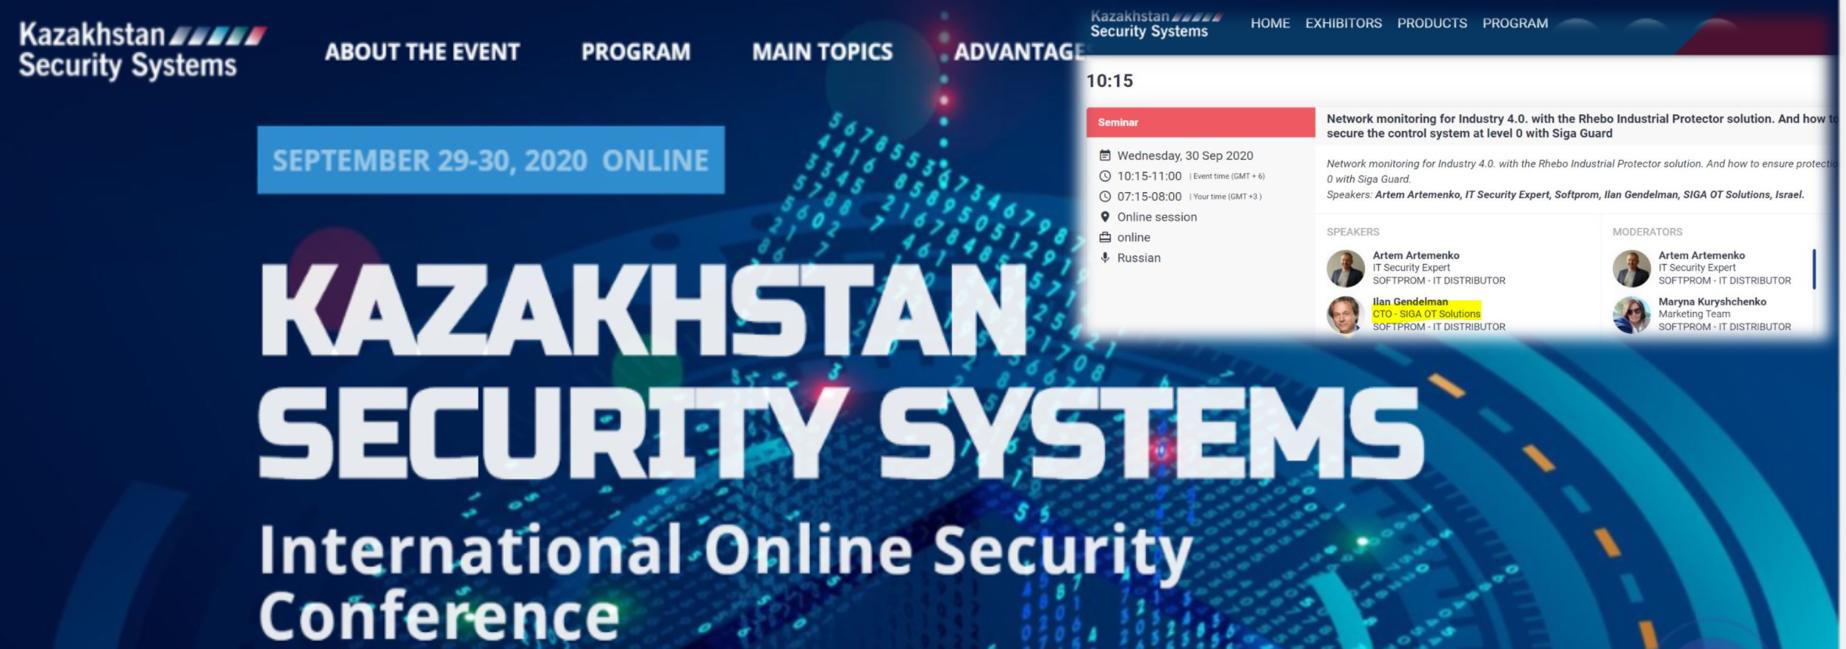 Kazakhstan Security